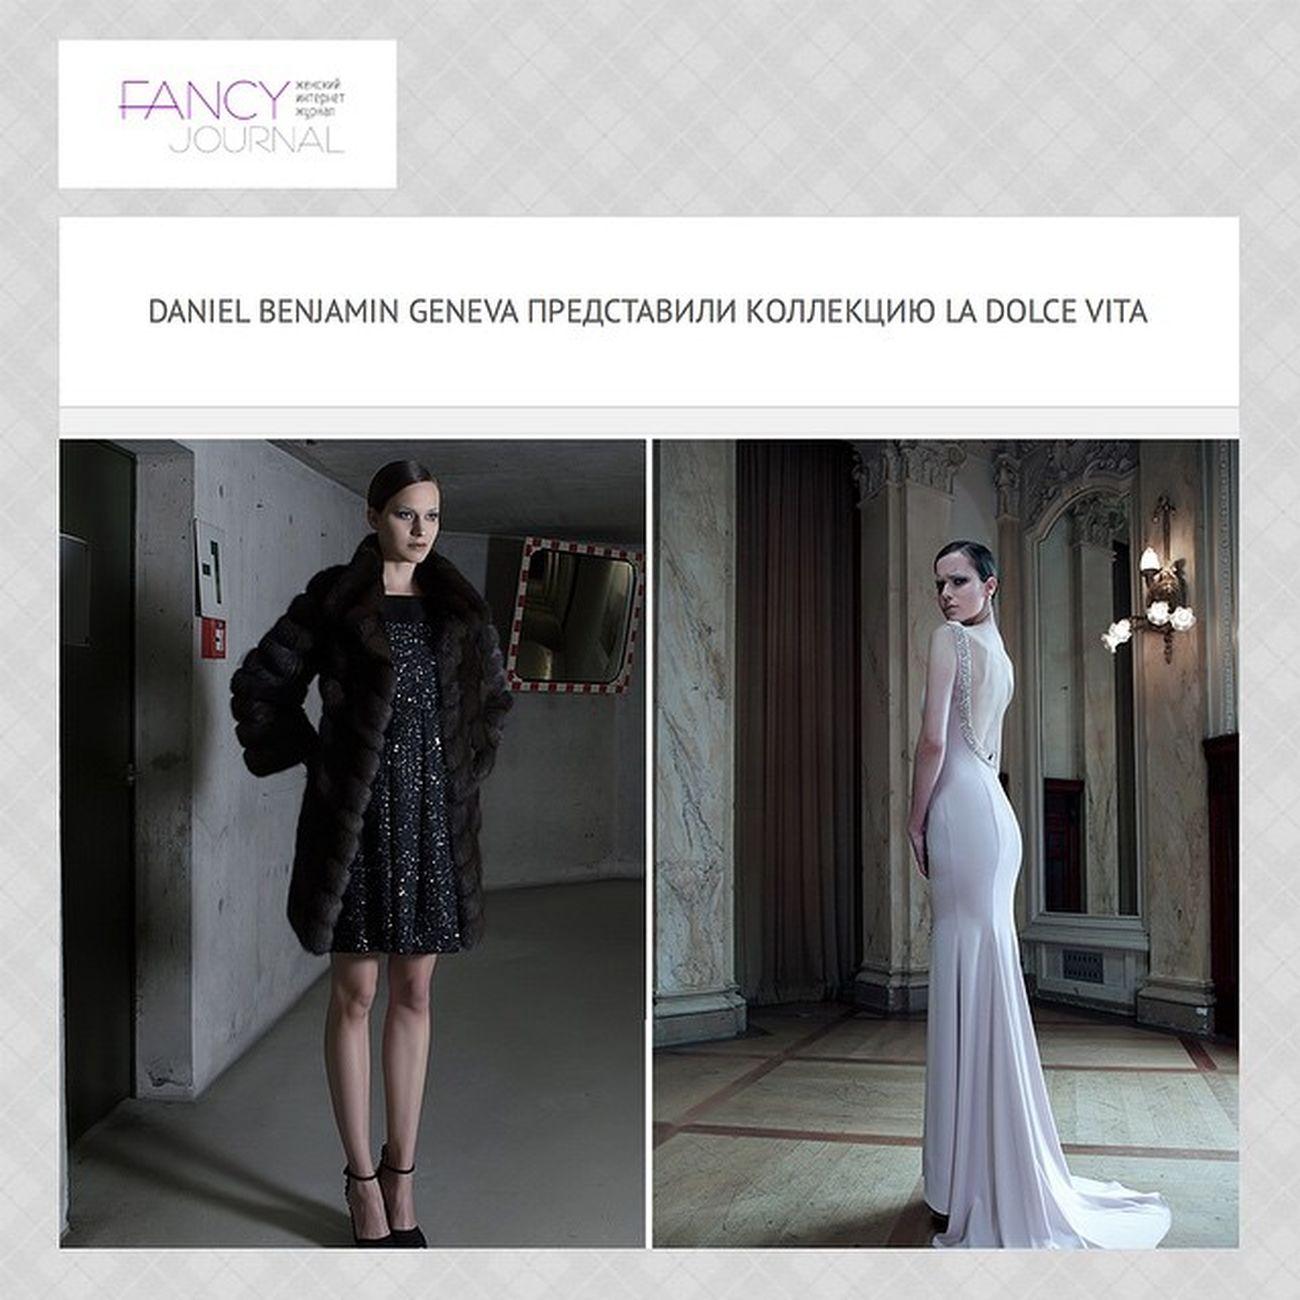 Daniel Benjamin Geneva presented new collection La Dolce Vita@danielbenjamingenevaFürs Luxury Fancyjournal